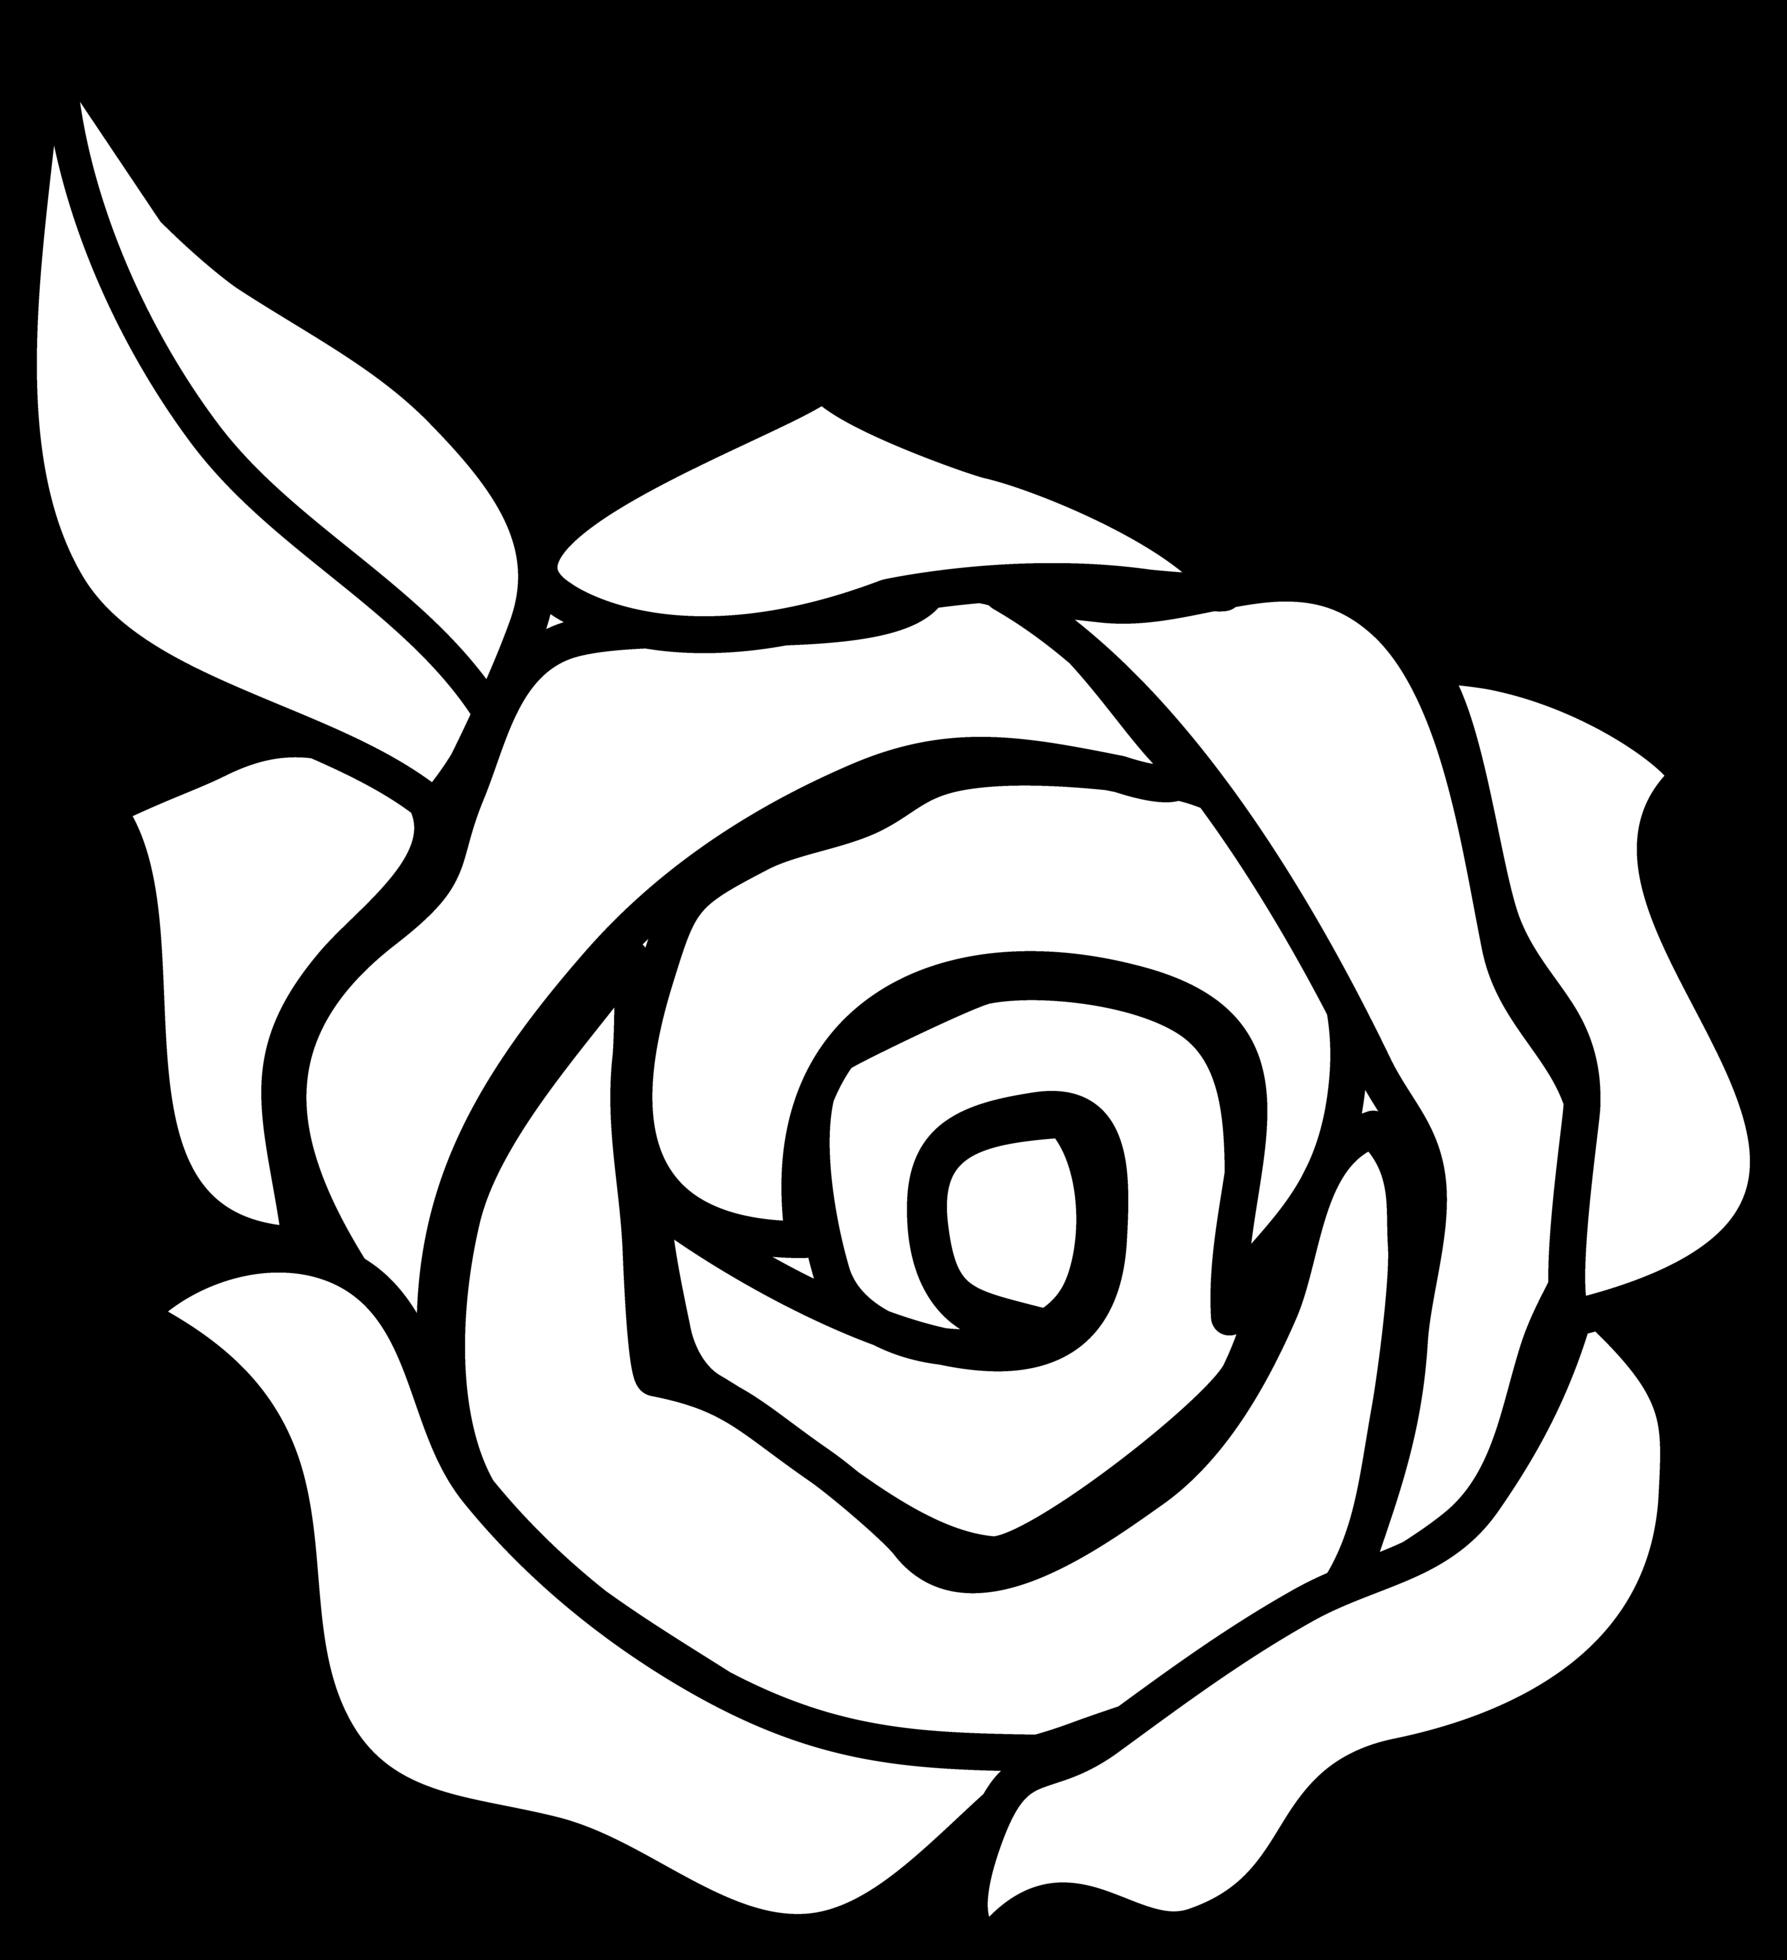 Rose clipart simple clip art download Free Simple Rose Drawings, Download Free Clip Art, Free Clip ... clip art download